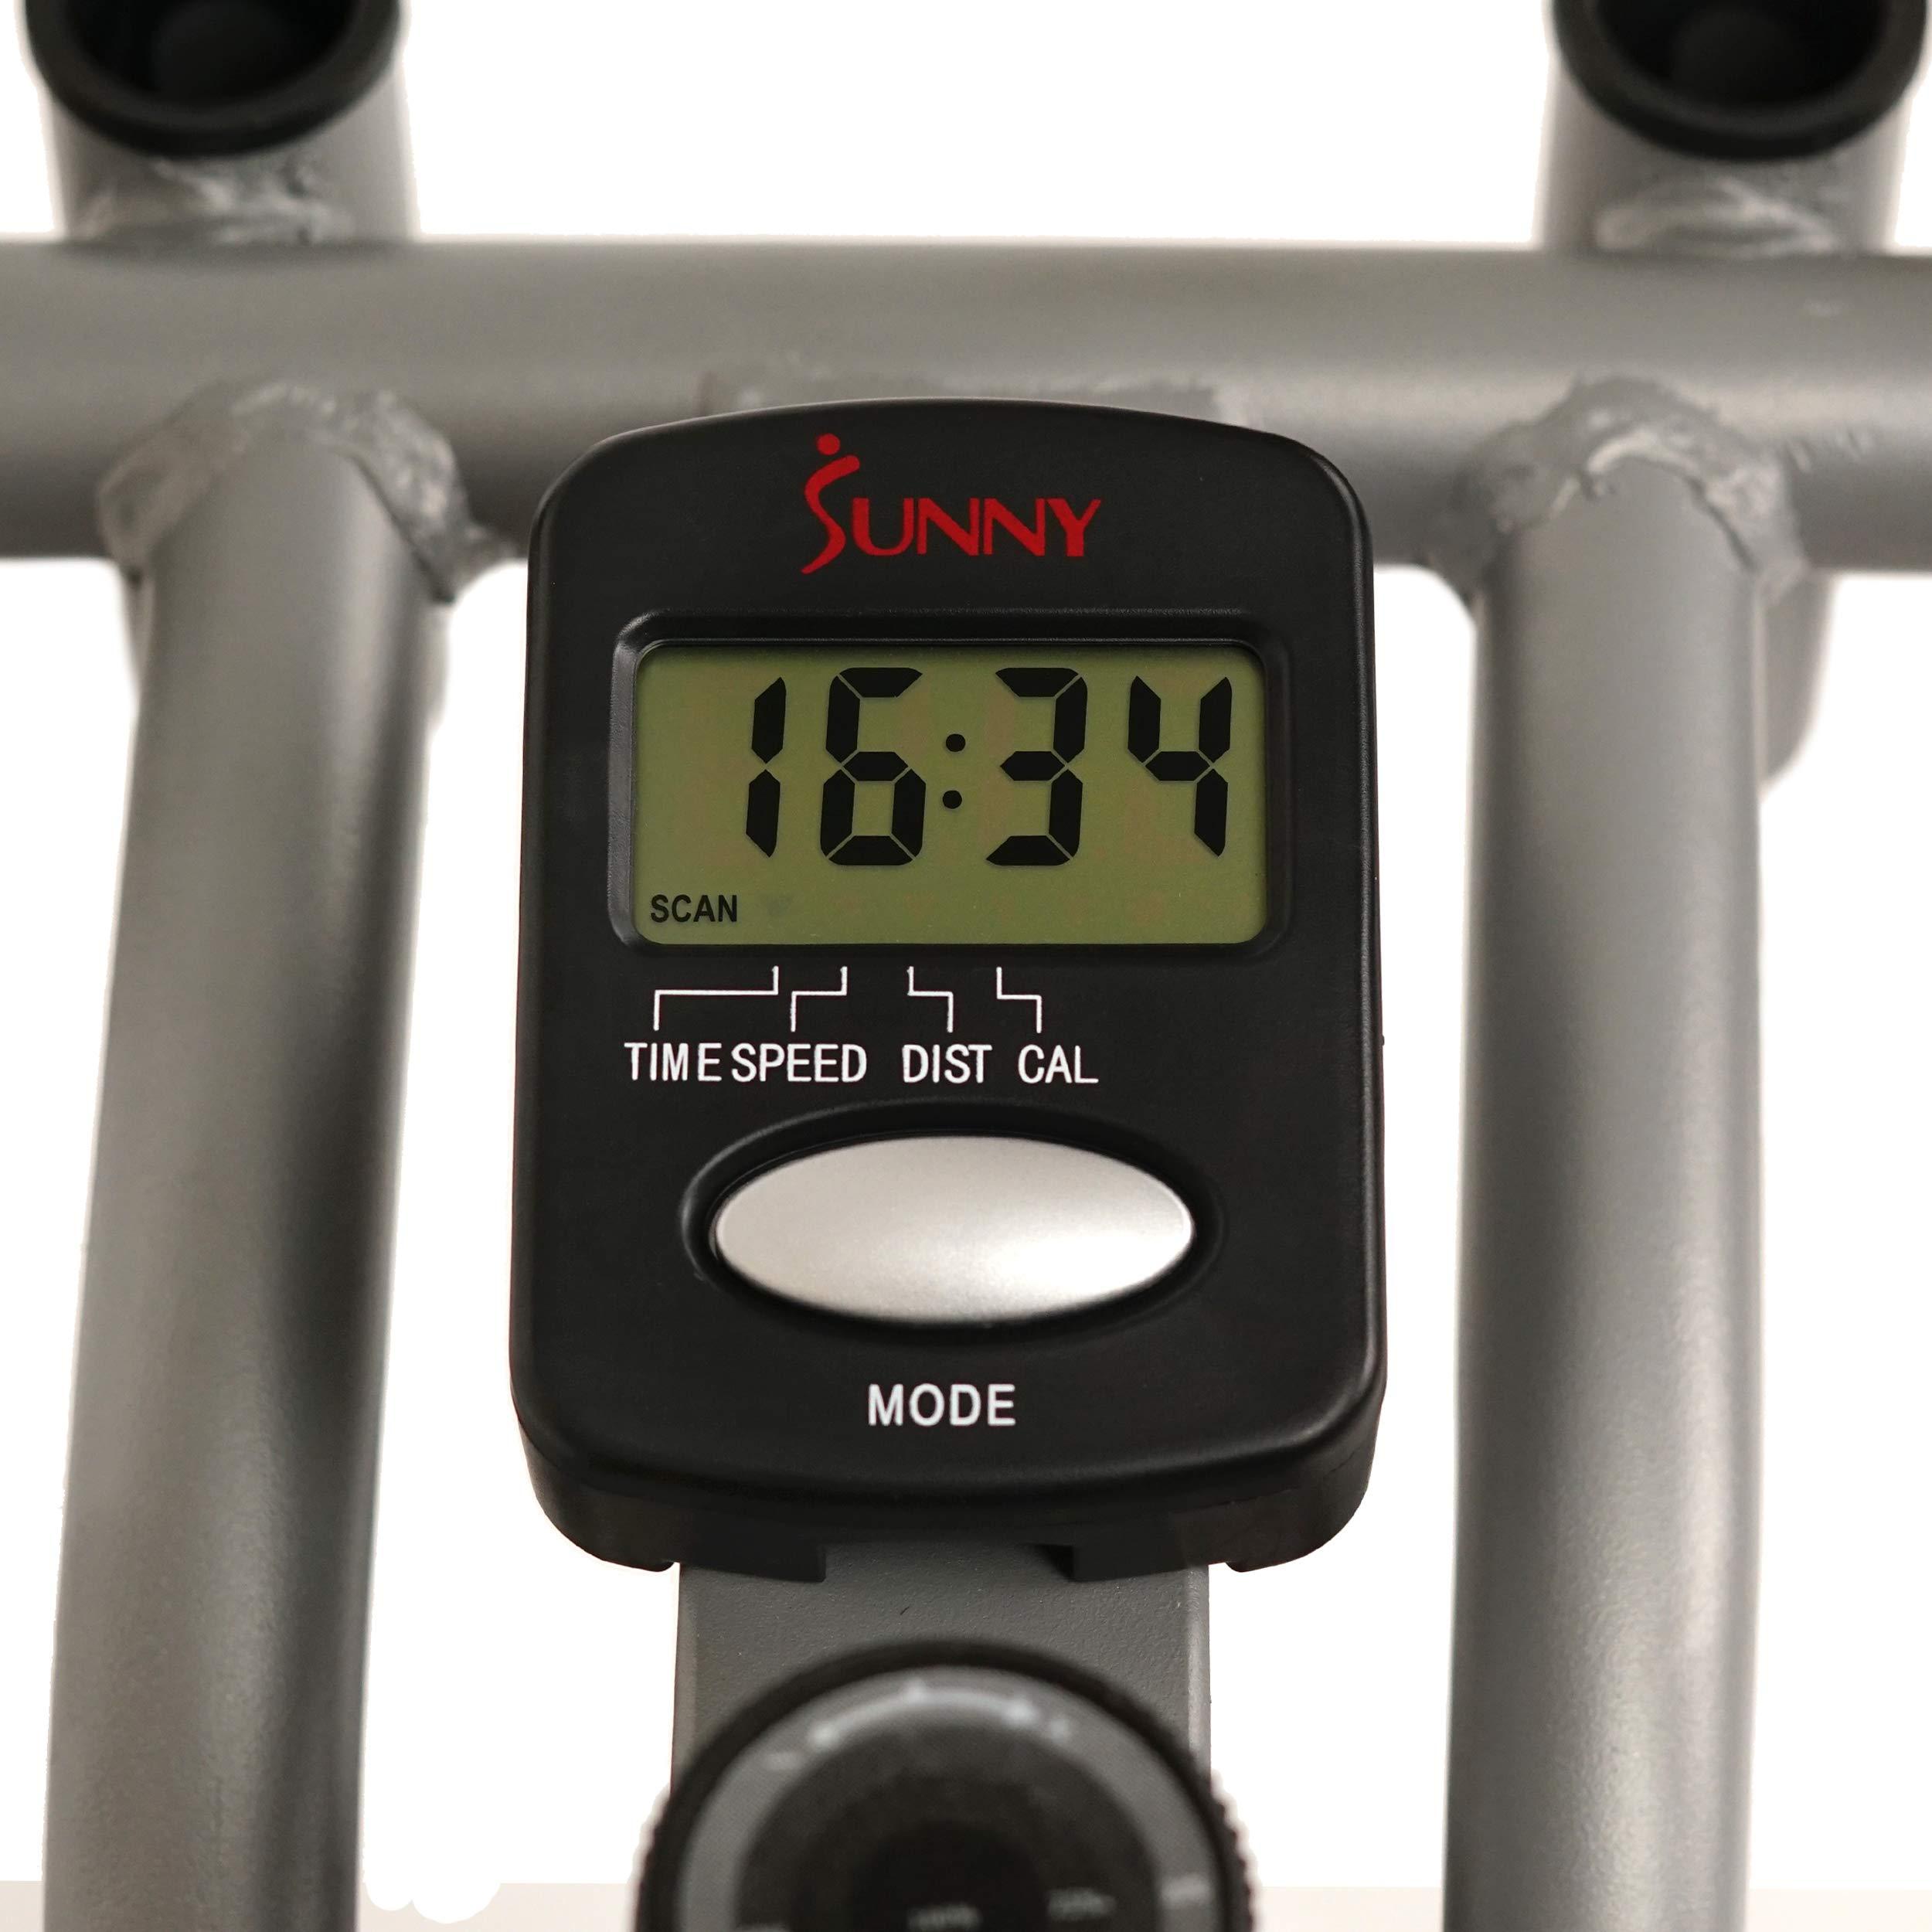 Sunny Health & Fitness SF-E1405 Flywheel Elliptical Trainer, Gray by Sunny Health & Fitness (Image #10)